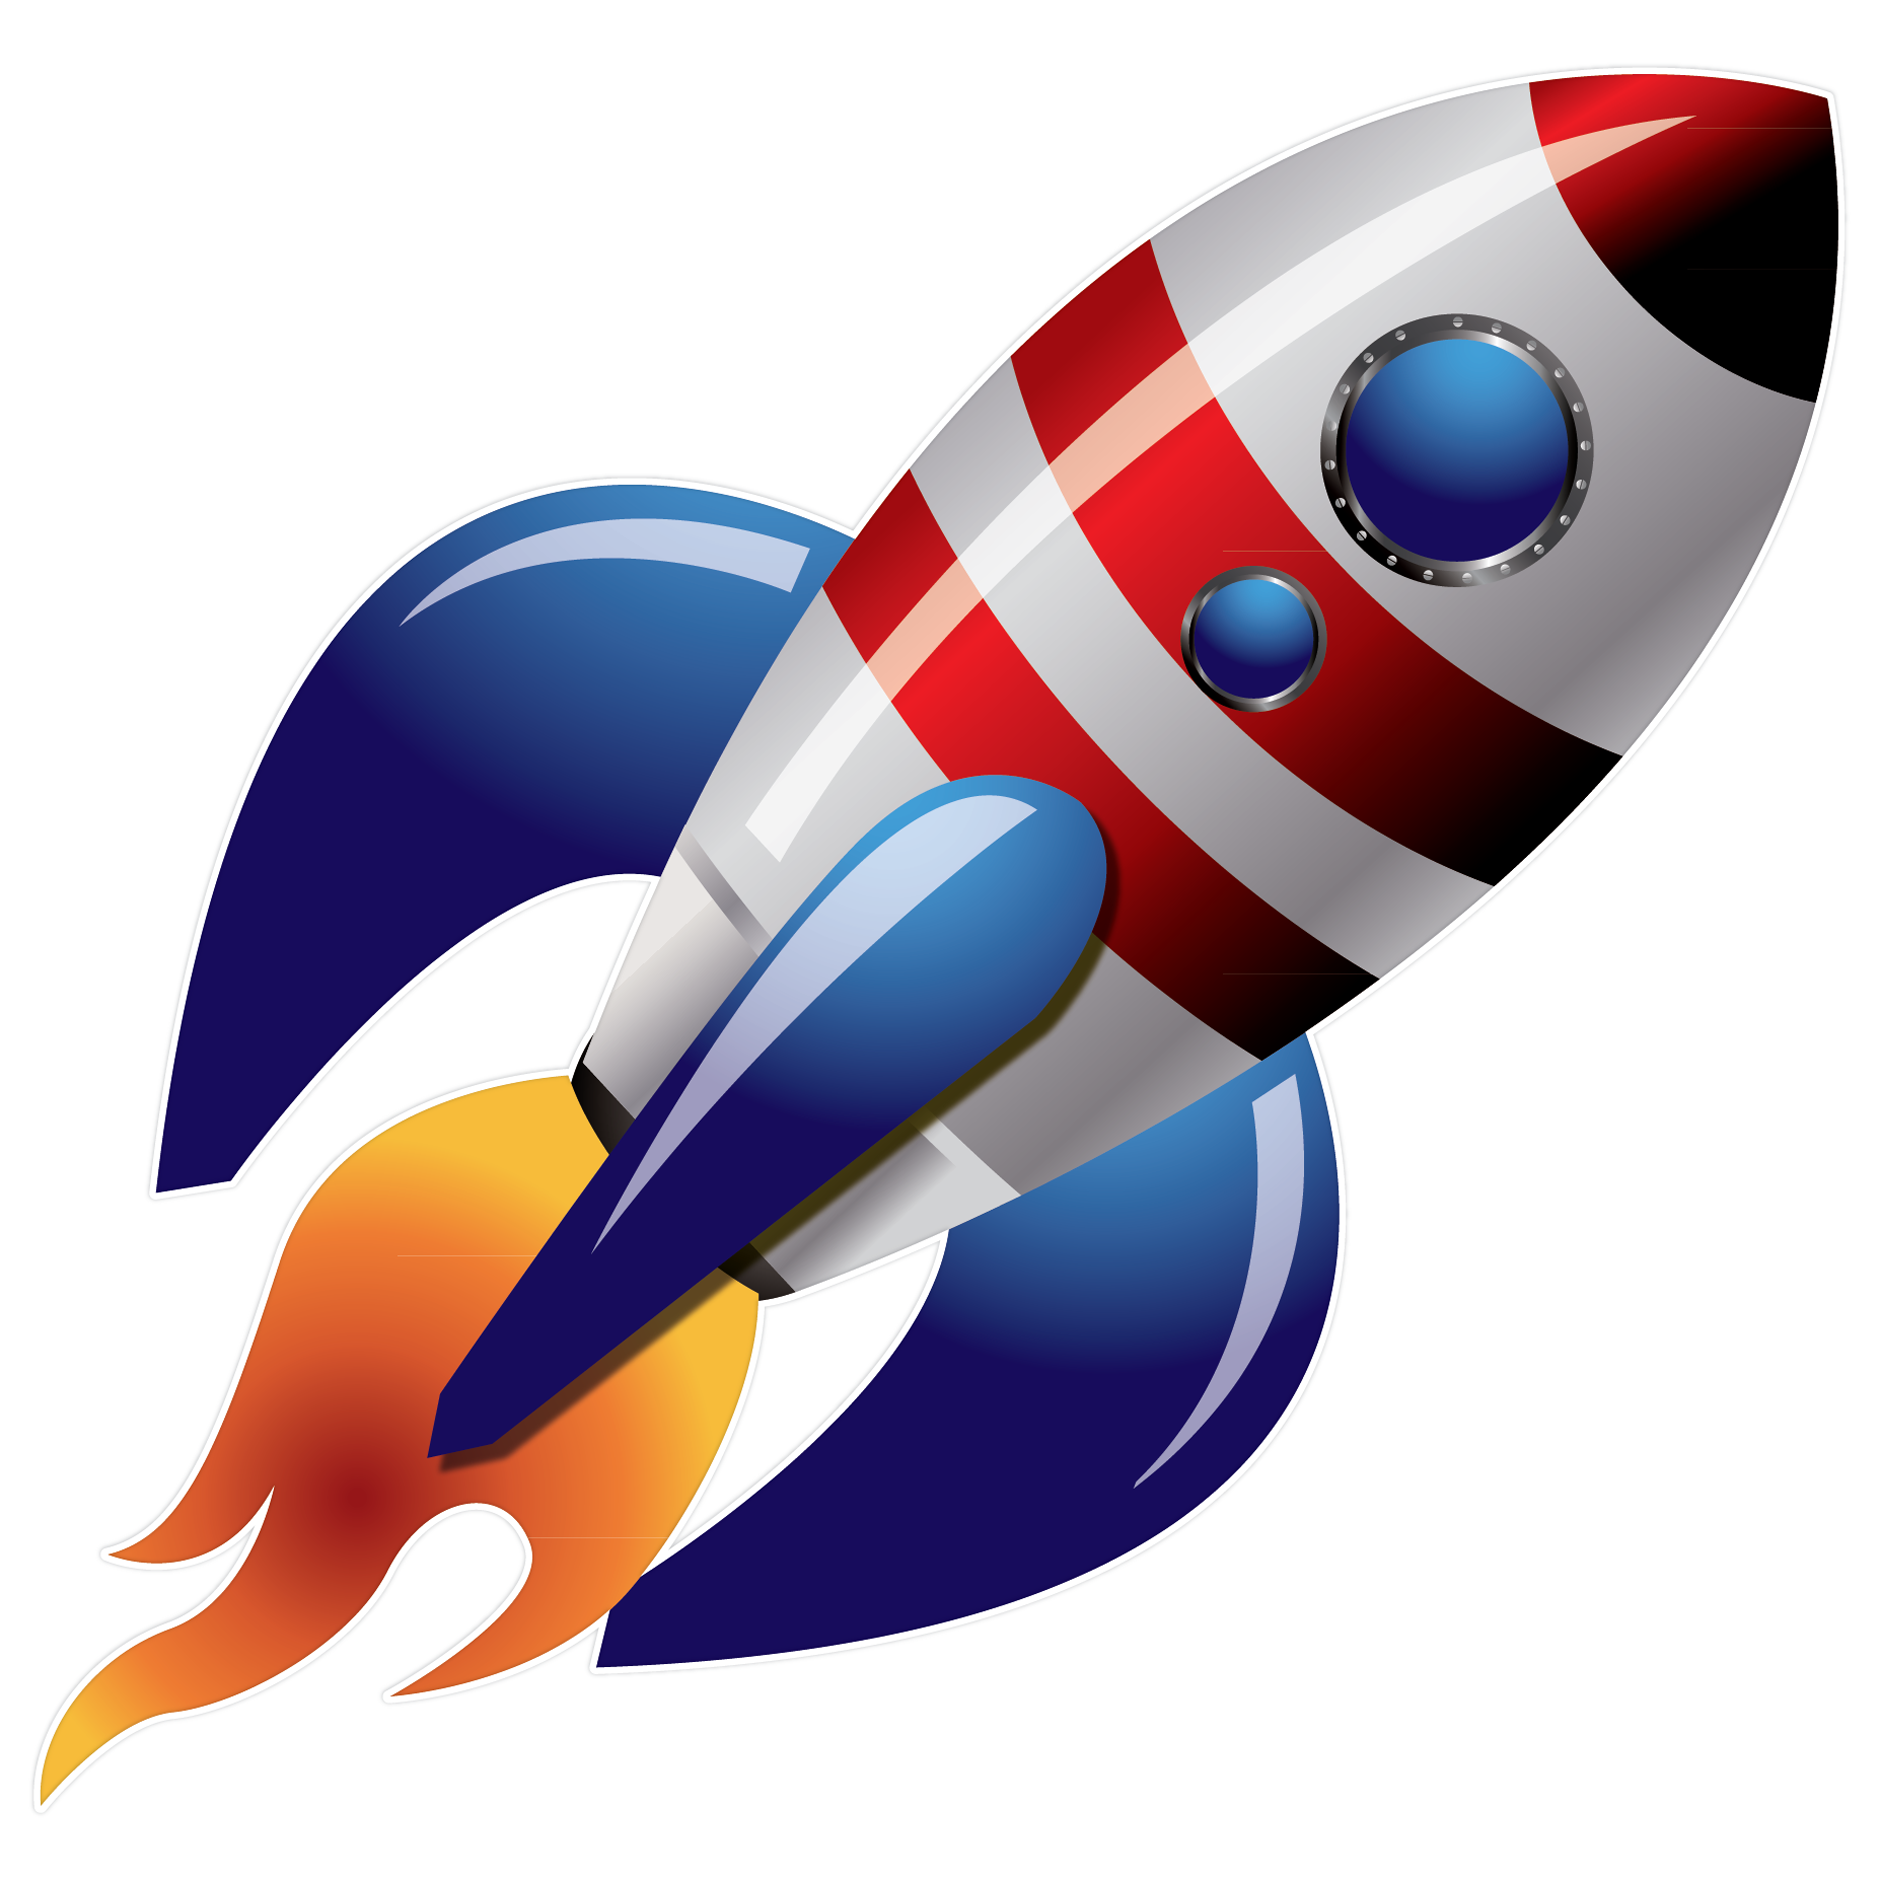 Woodworth Middle School 6th grade Rocket Club - Google  - Rocket Ship PNG HD